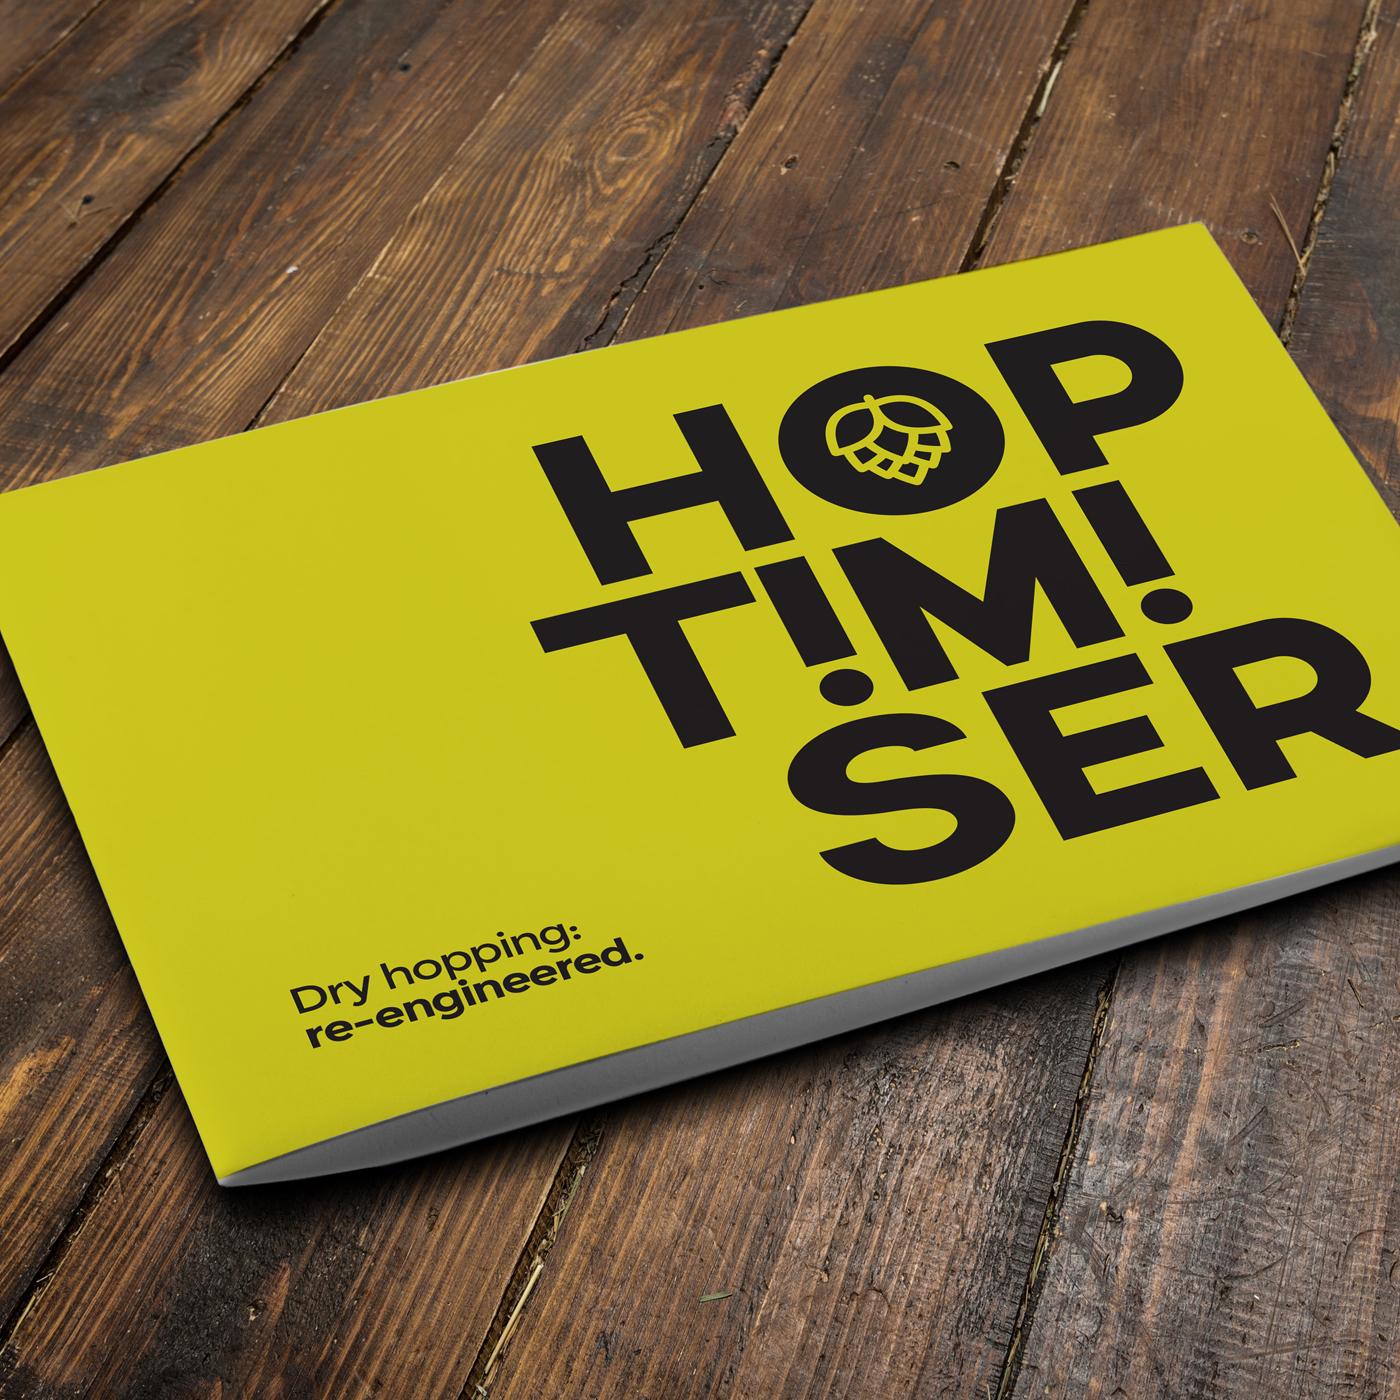 Hoptimiser case study - 2